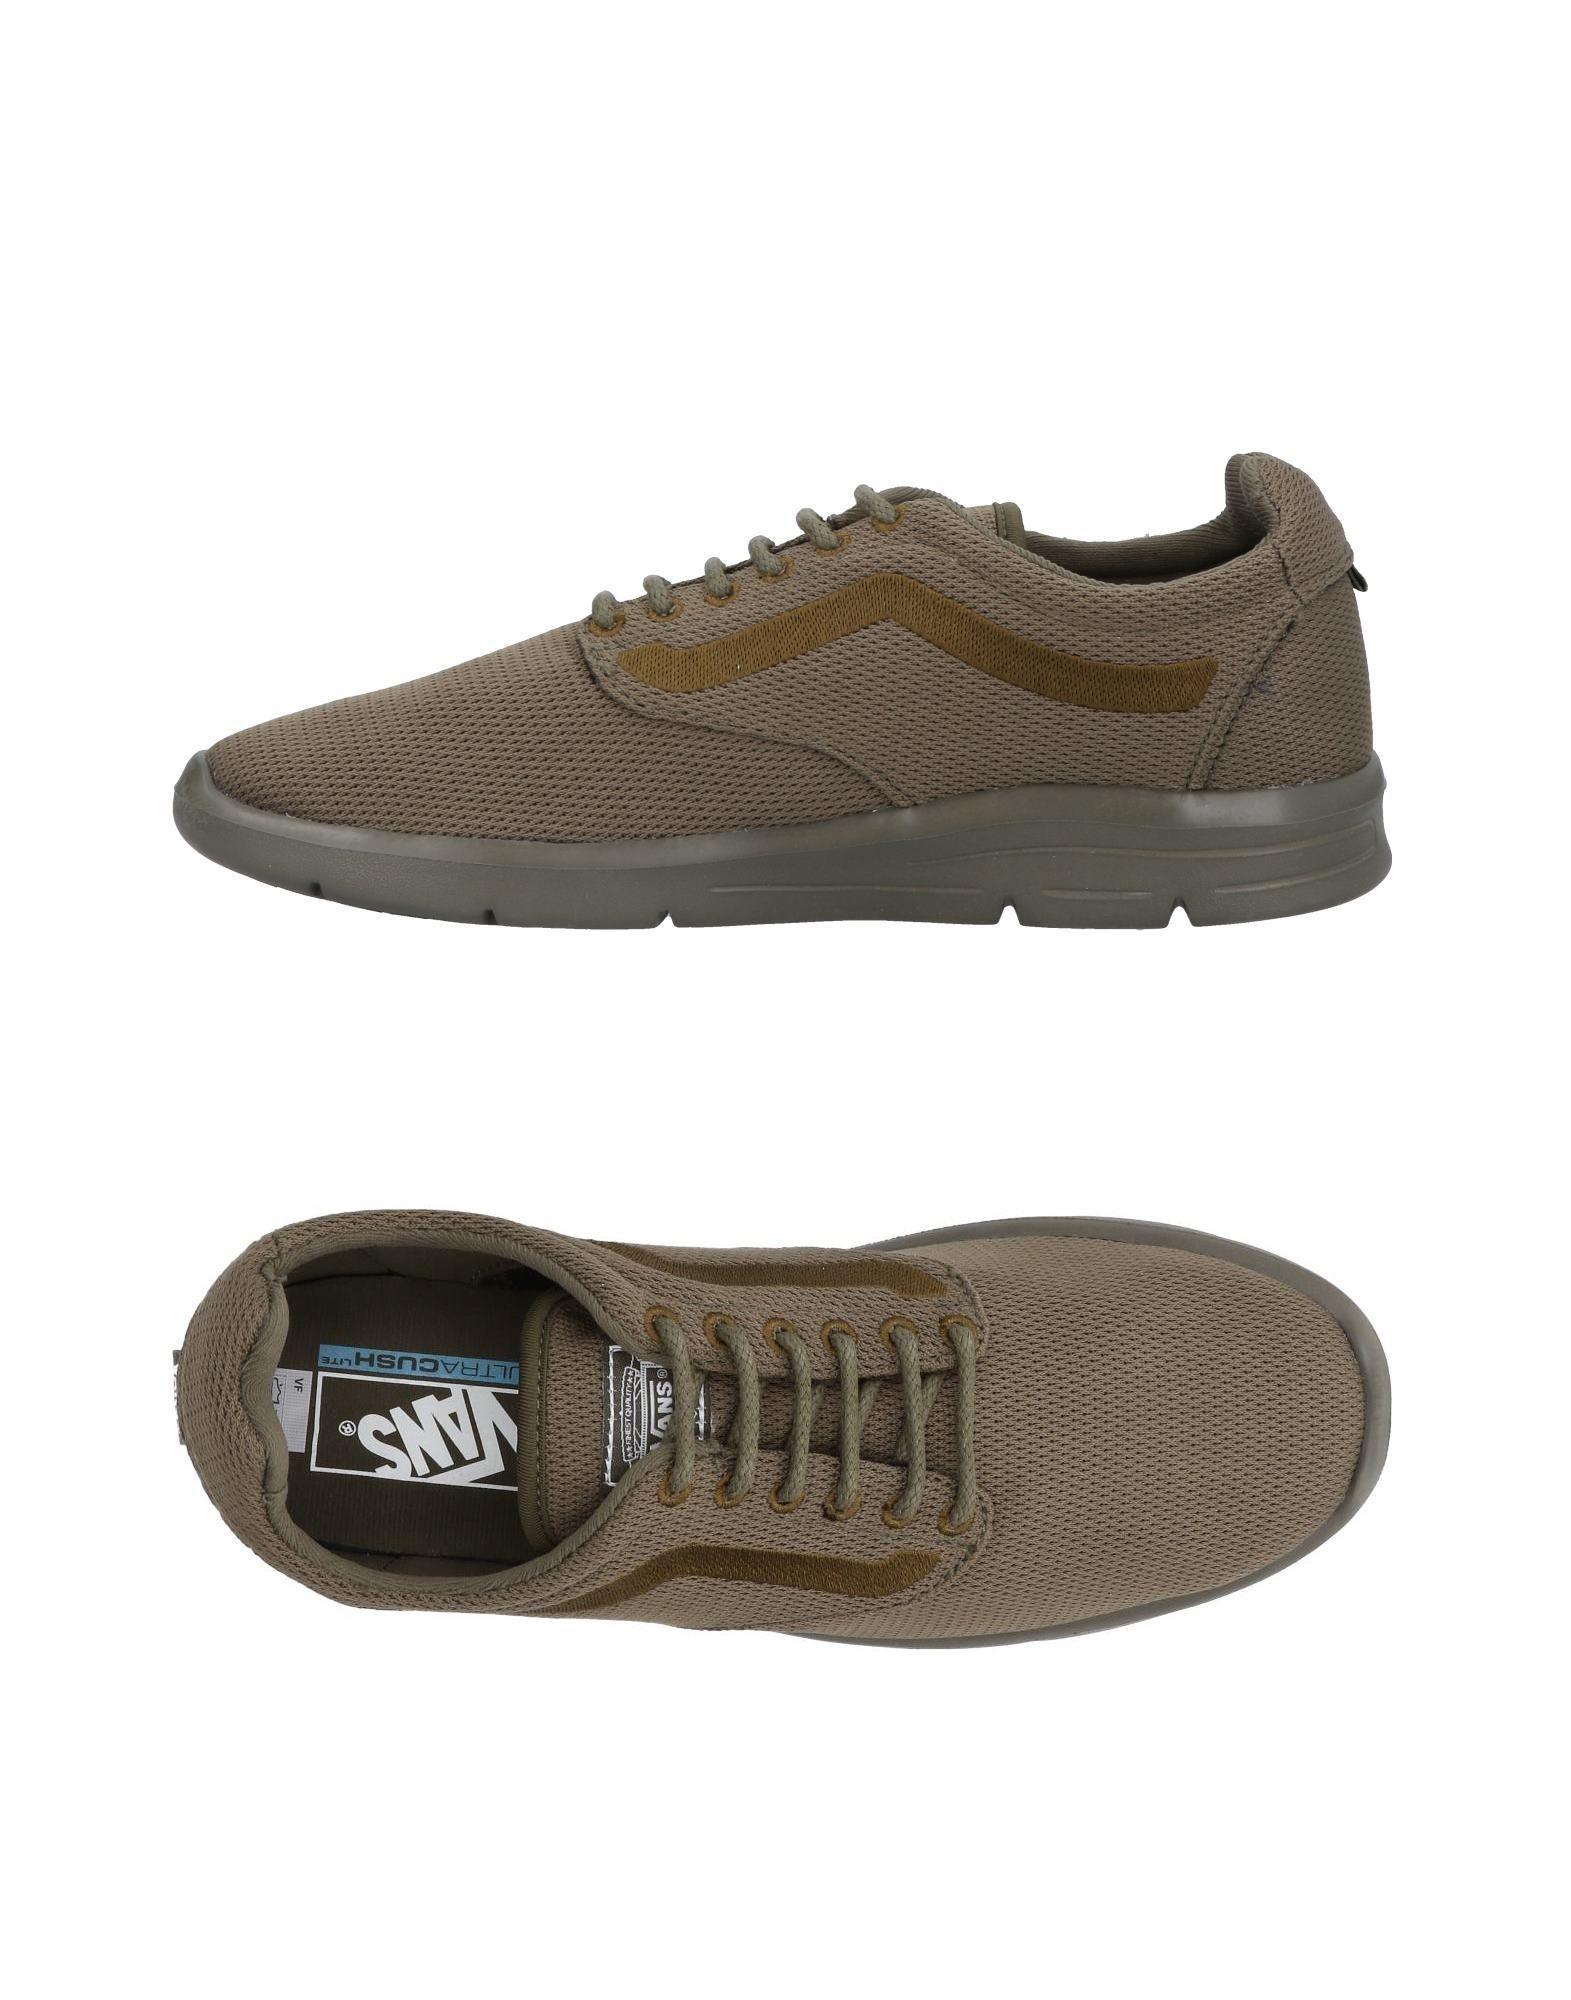 Moda Sneakers Vans Uomo - 11468954BK